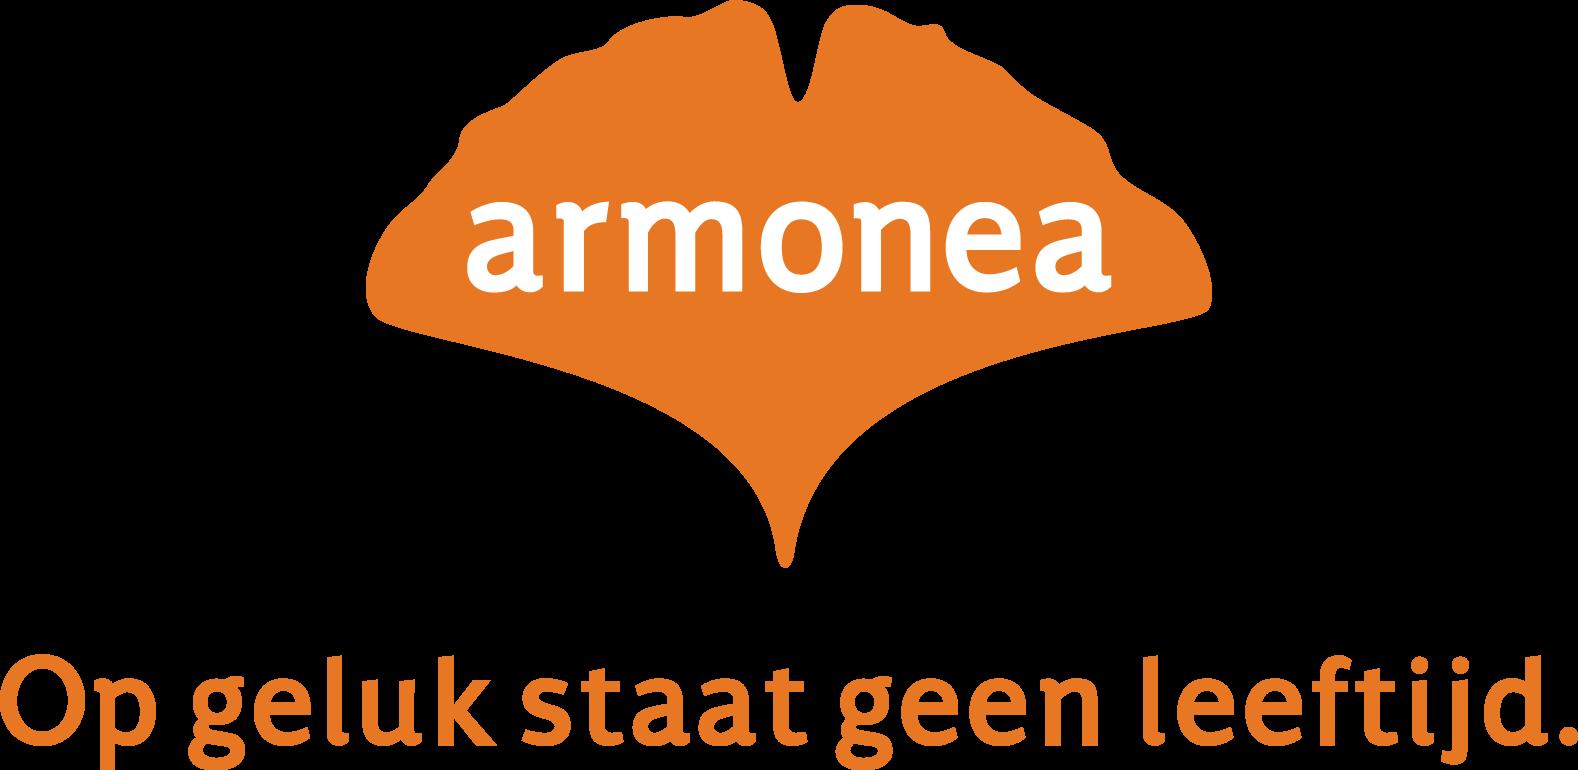 Armonea_rgb_pos_tcnl_orange_large.png